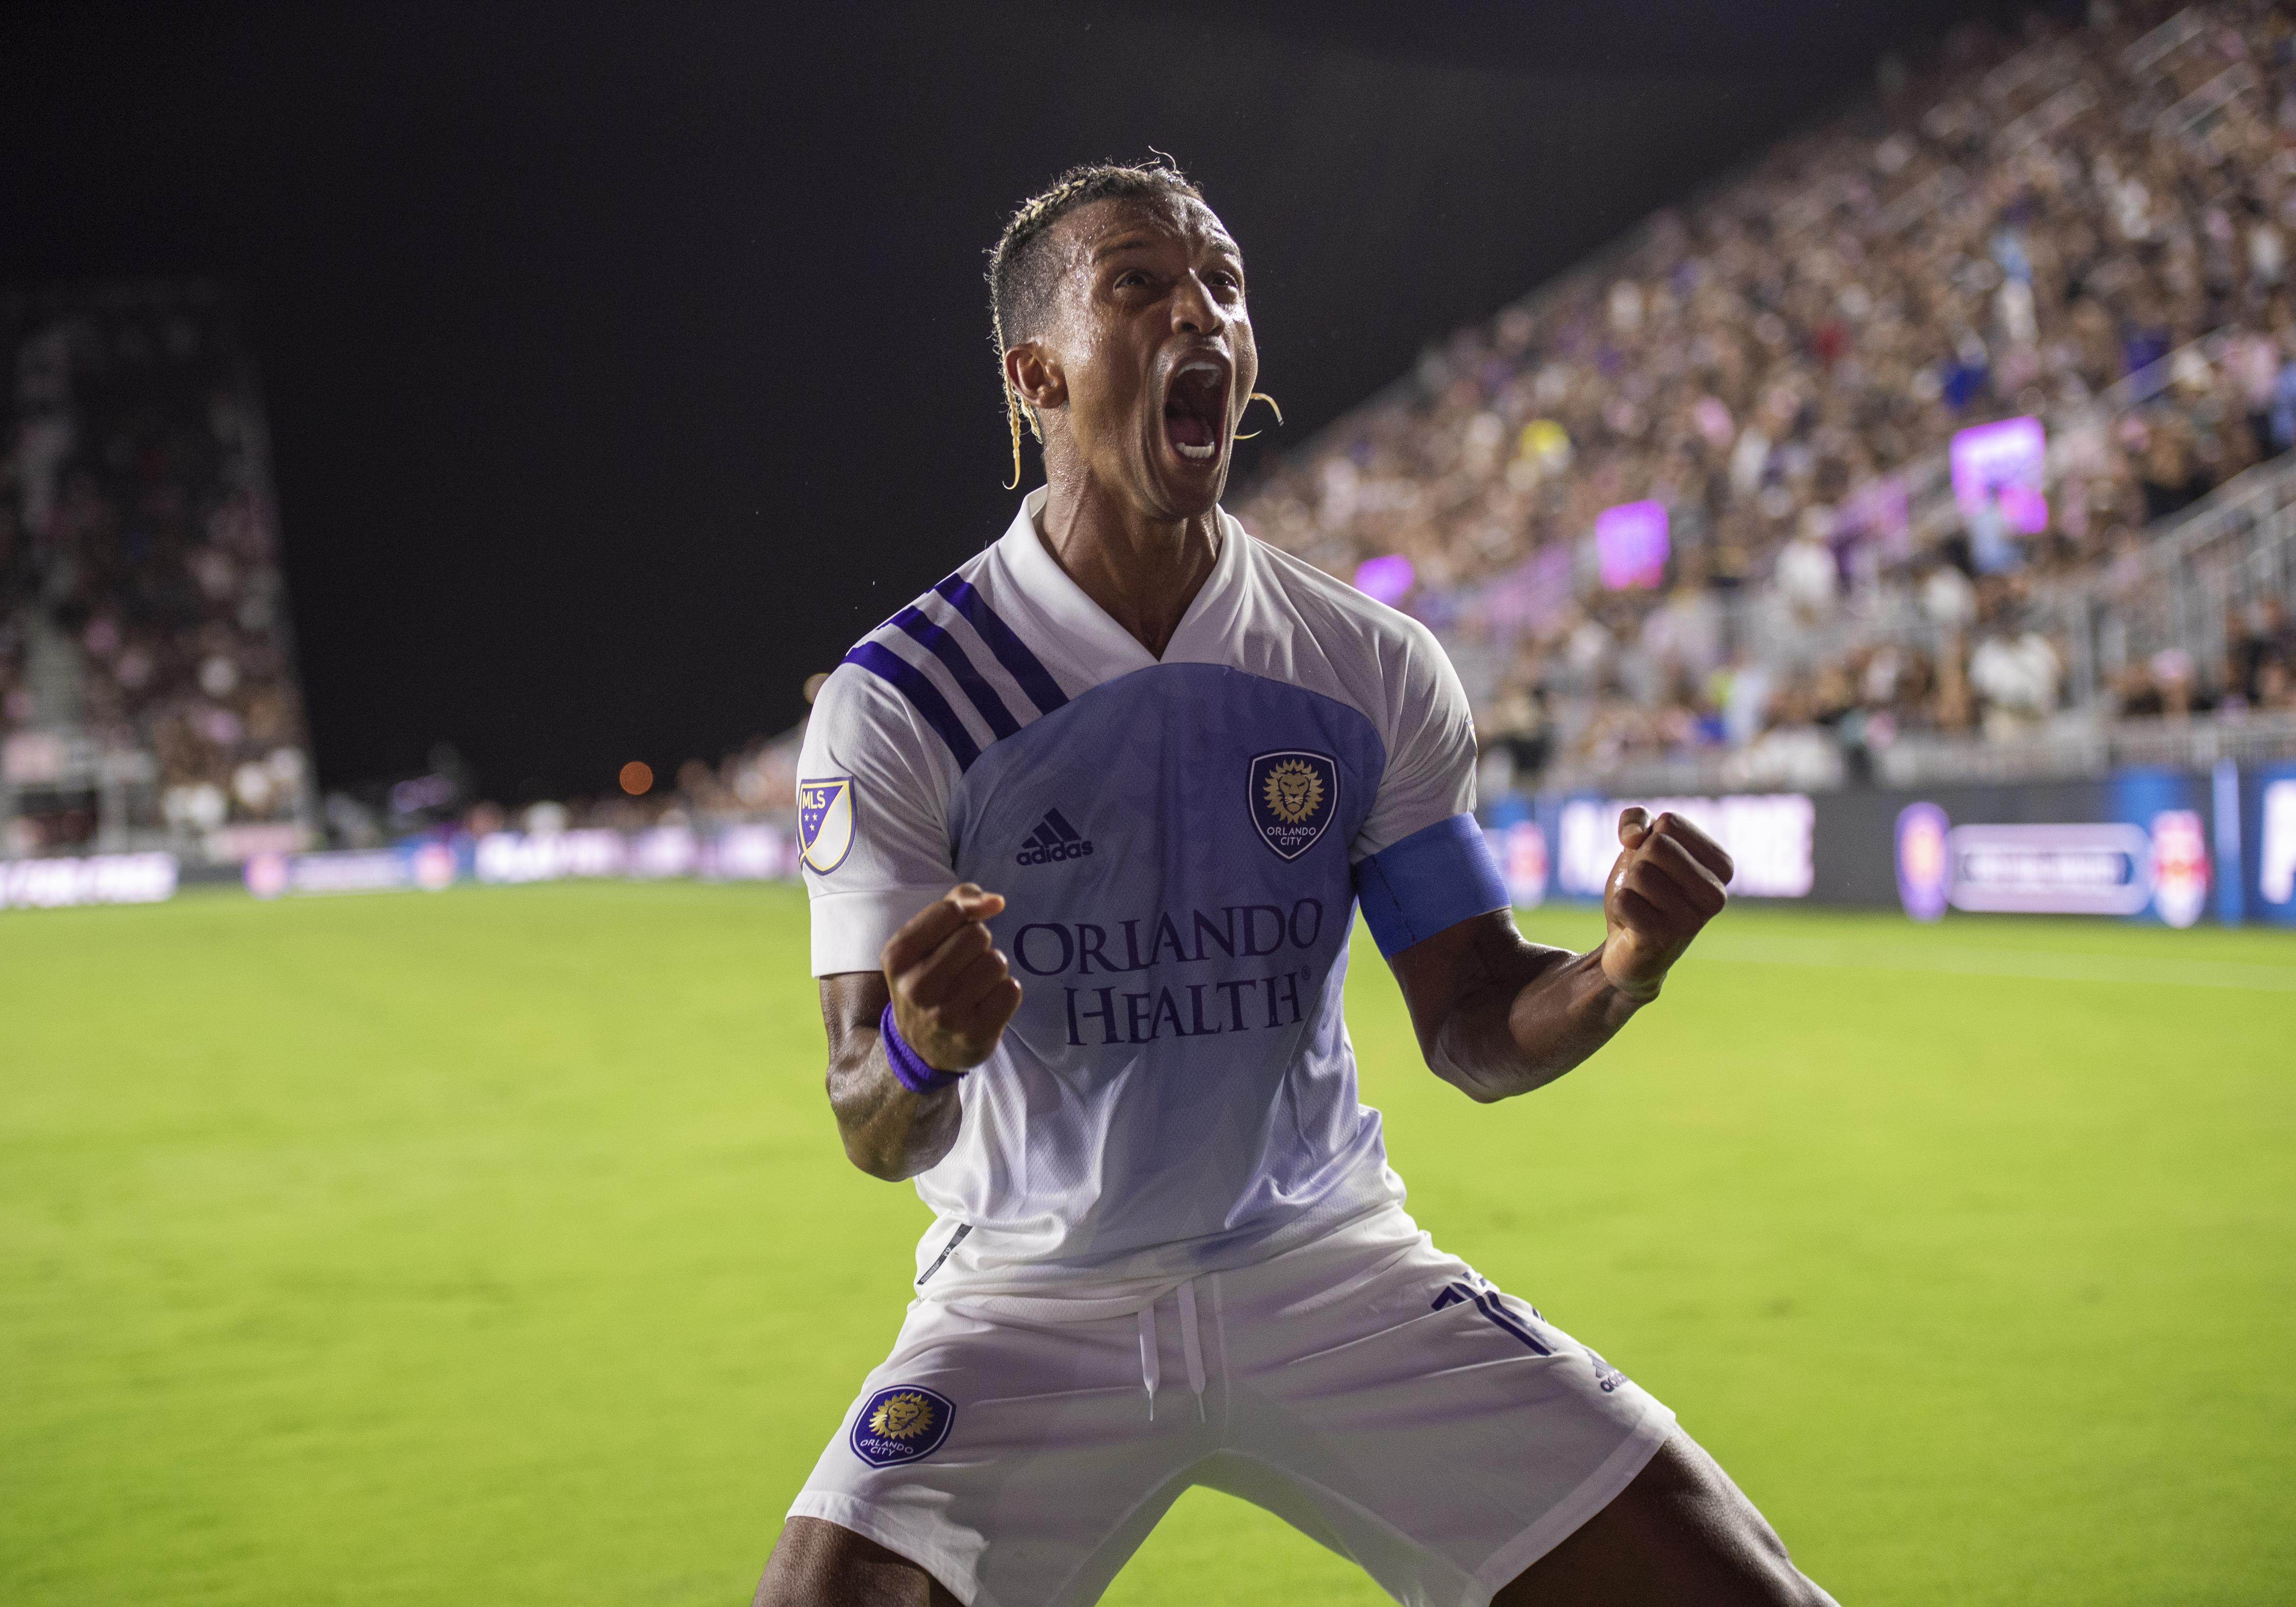 SOCCER: JUN 25 MLS - Orlando City SC at Inter Miami CF